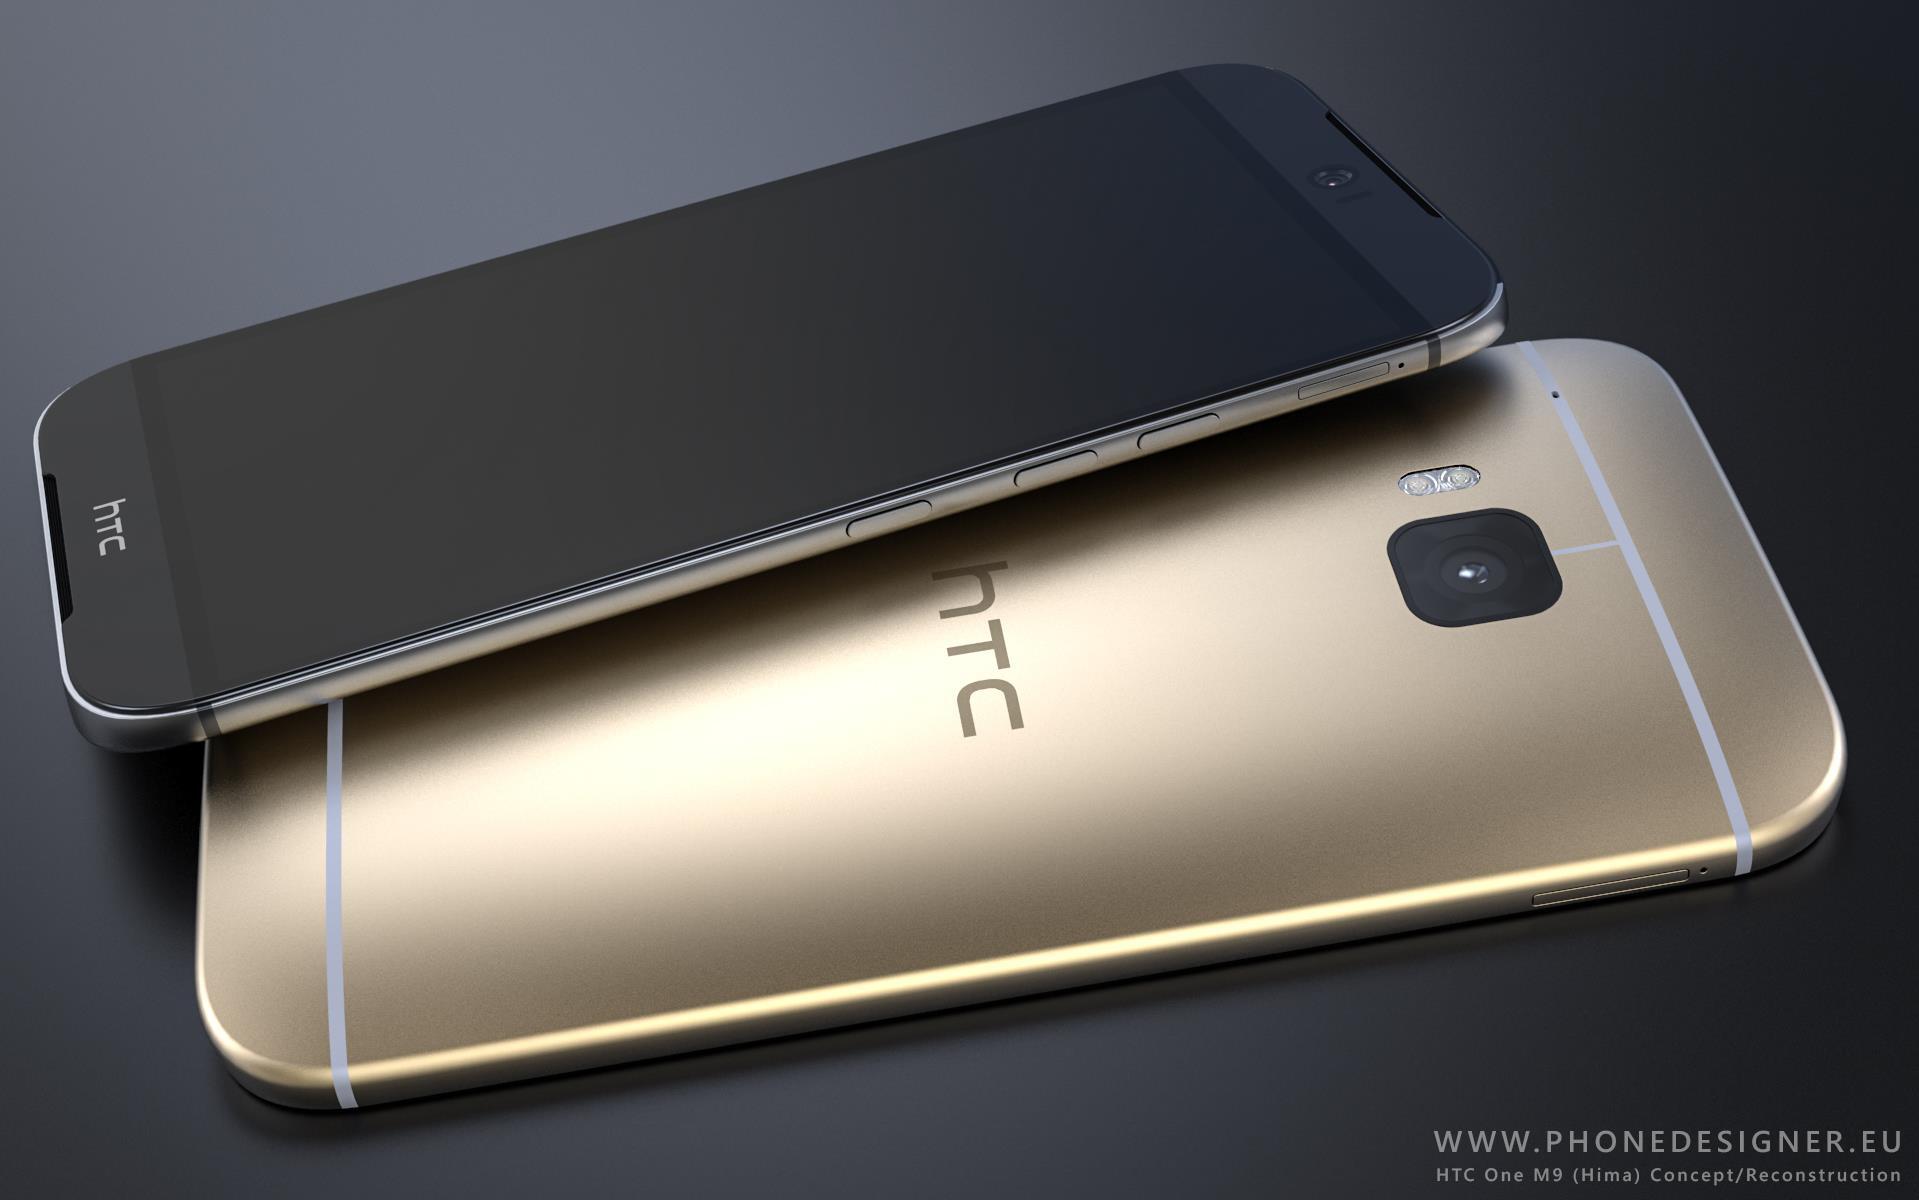 The HTC One M9 ... Iphone 7 Plus Black Friday Deals Verizon